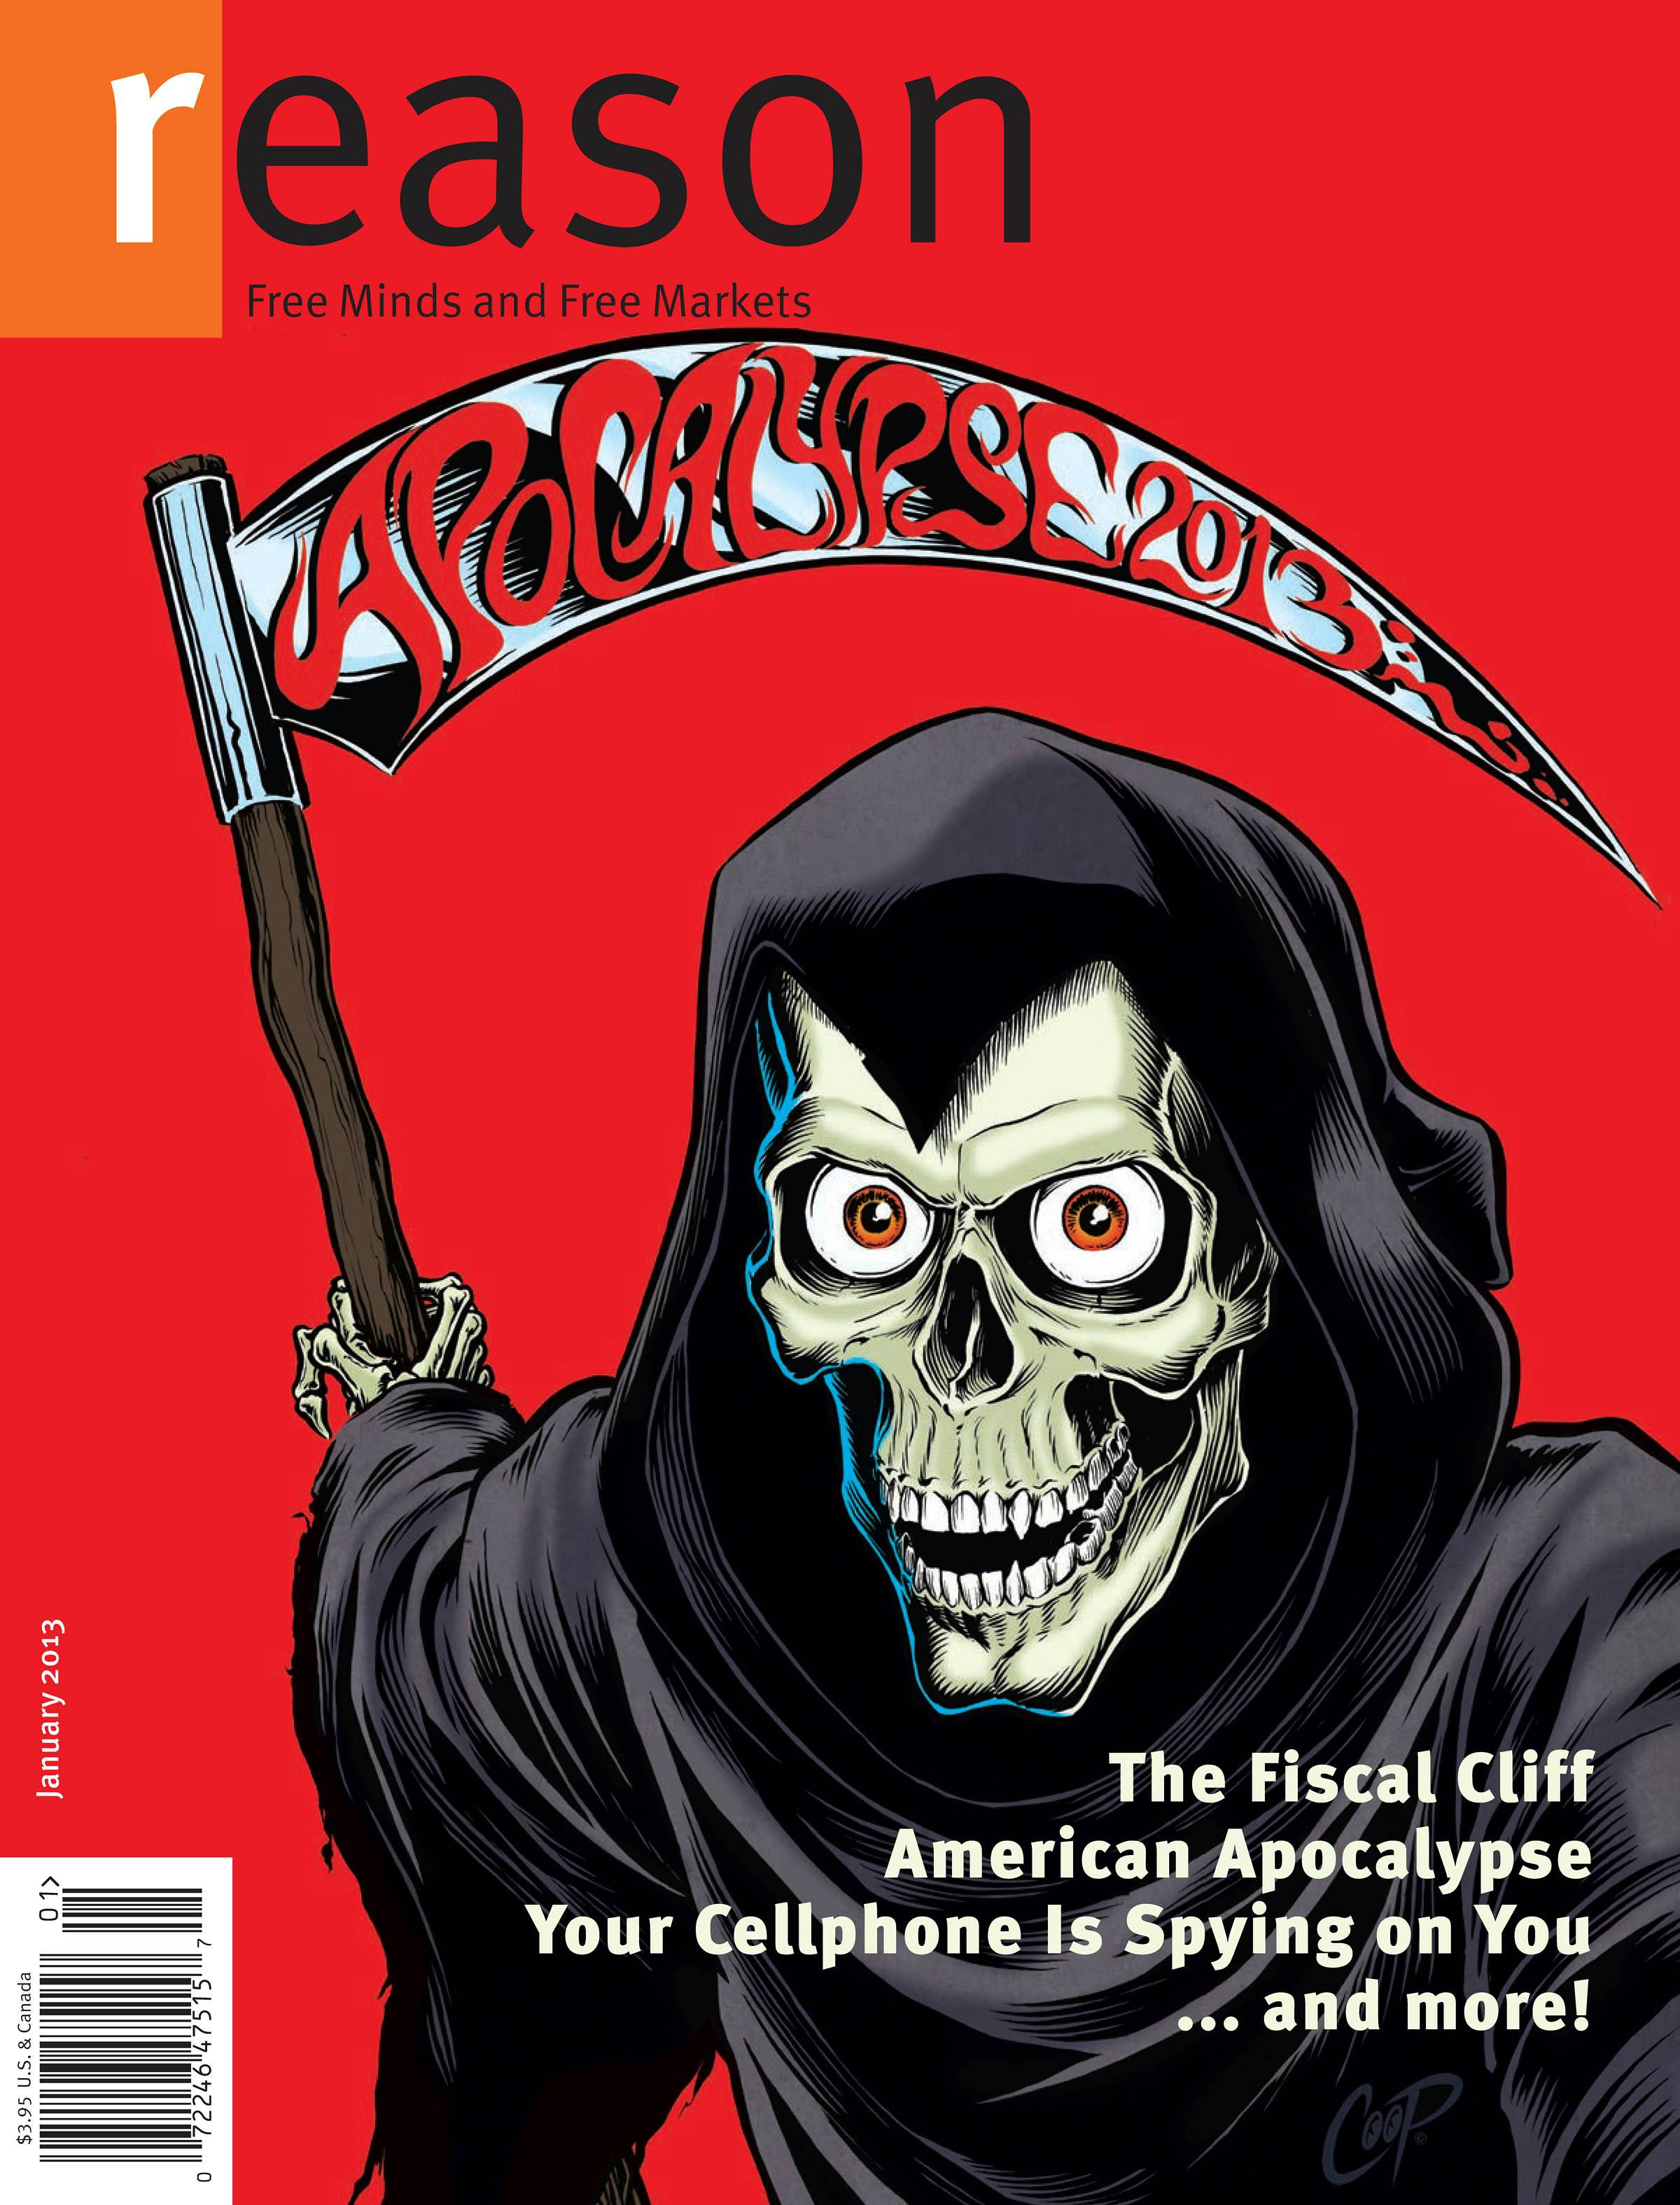 Reason Magazine, January 2013 cover image